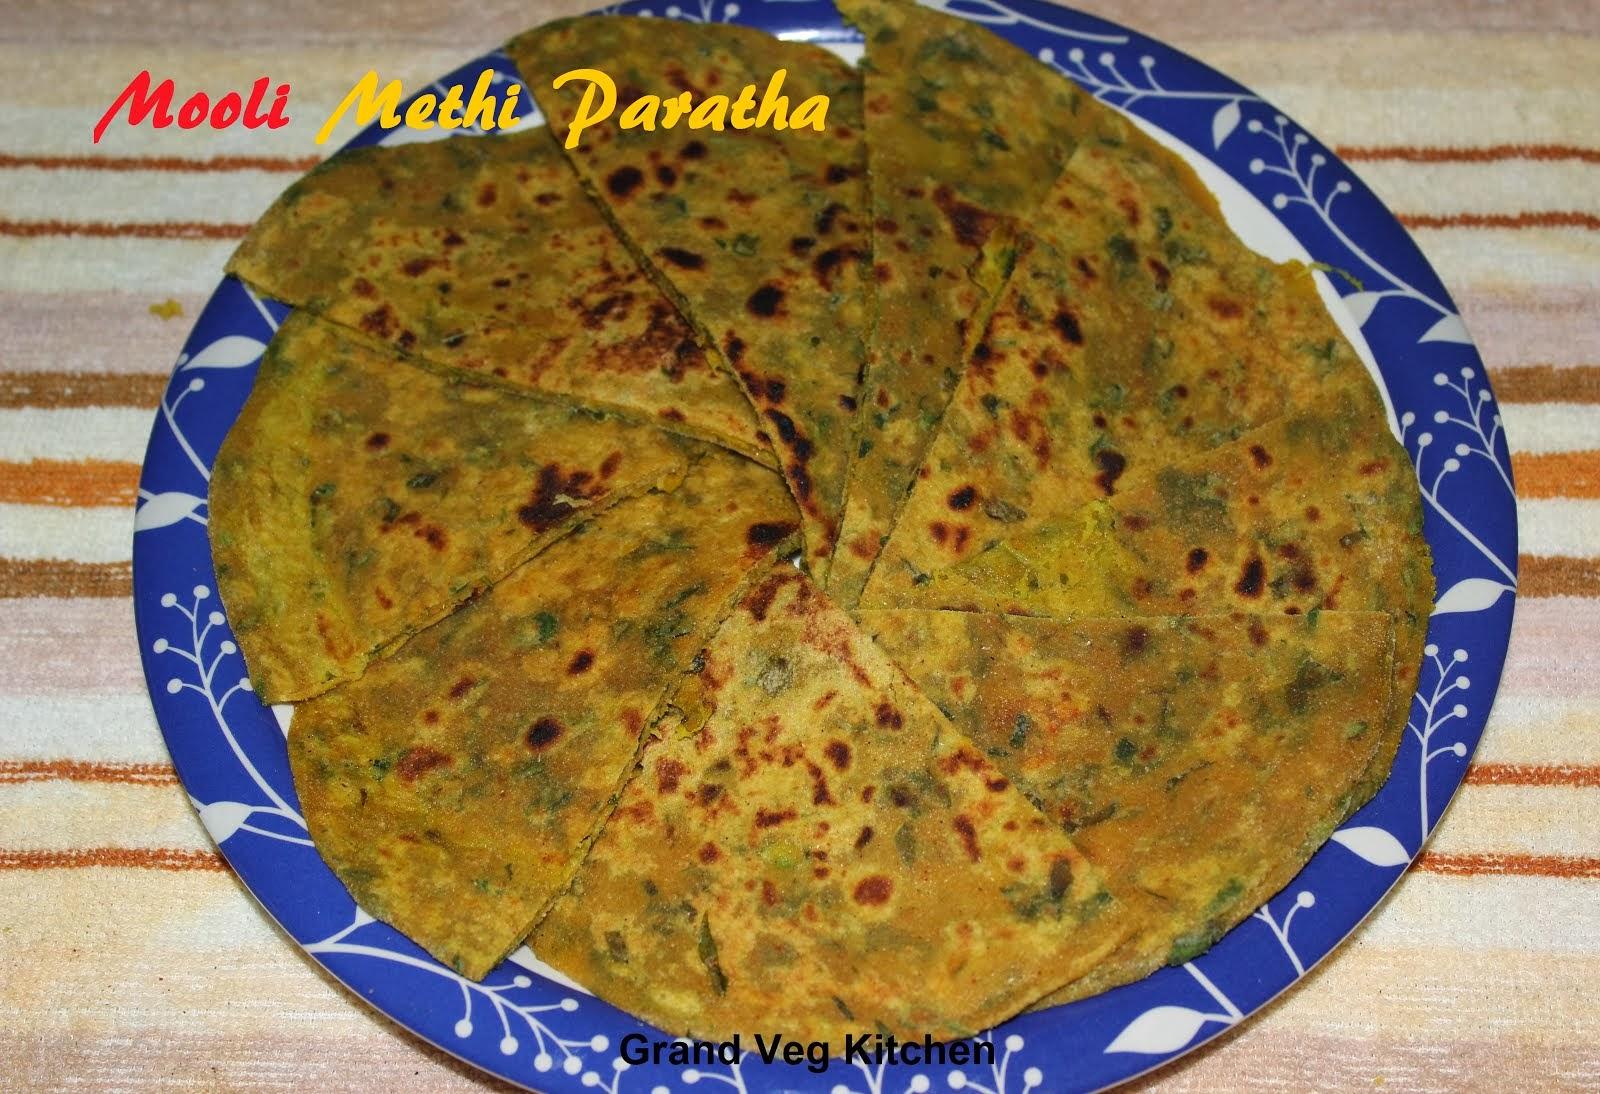 Mooli Methi Paratha